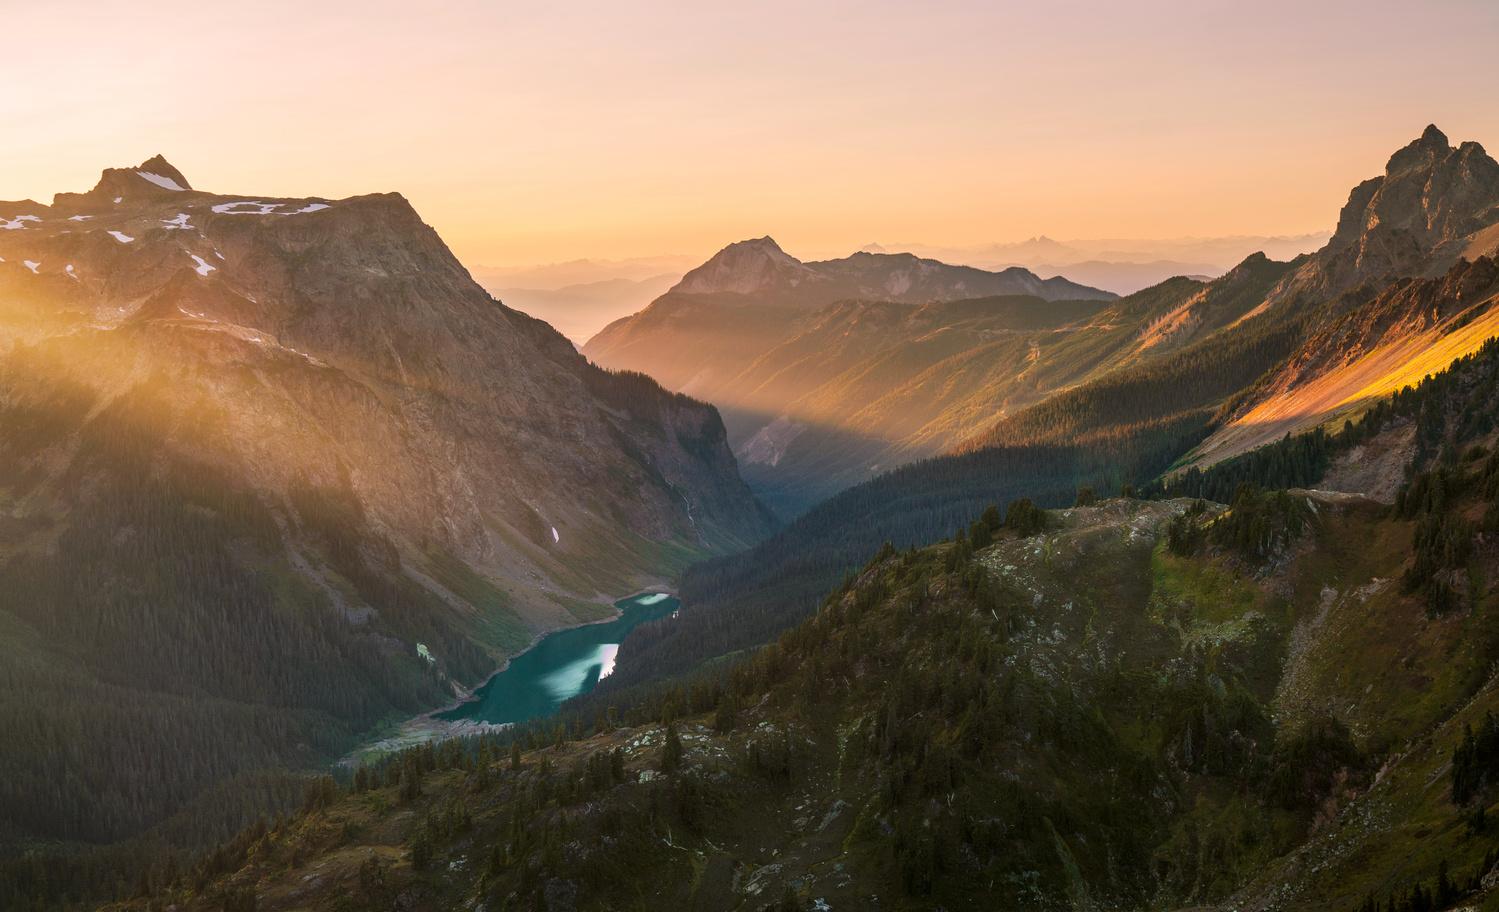 Mount Baker Wilderness by Autumn Schrock